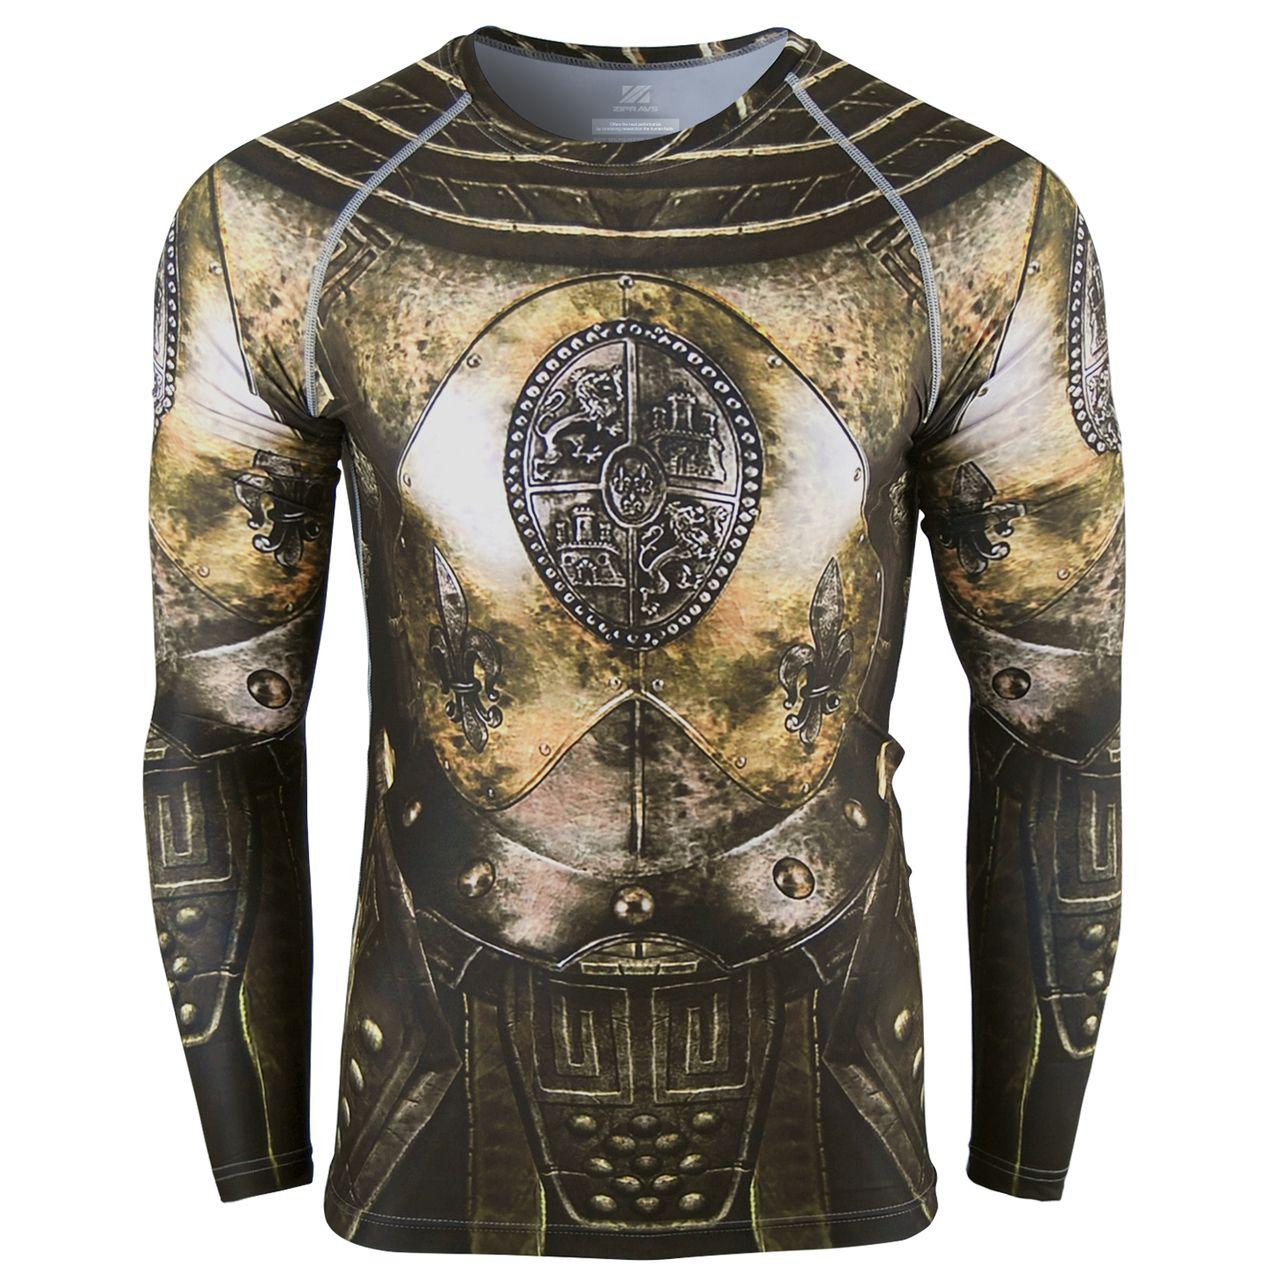 Armour compression tight shirt under layer running t shirt рисунки